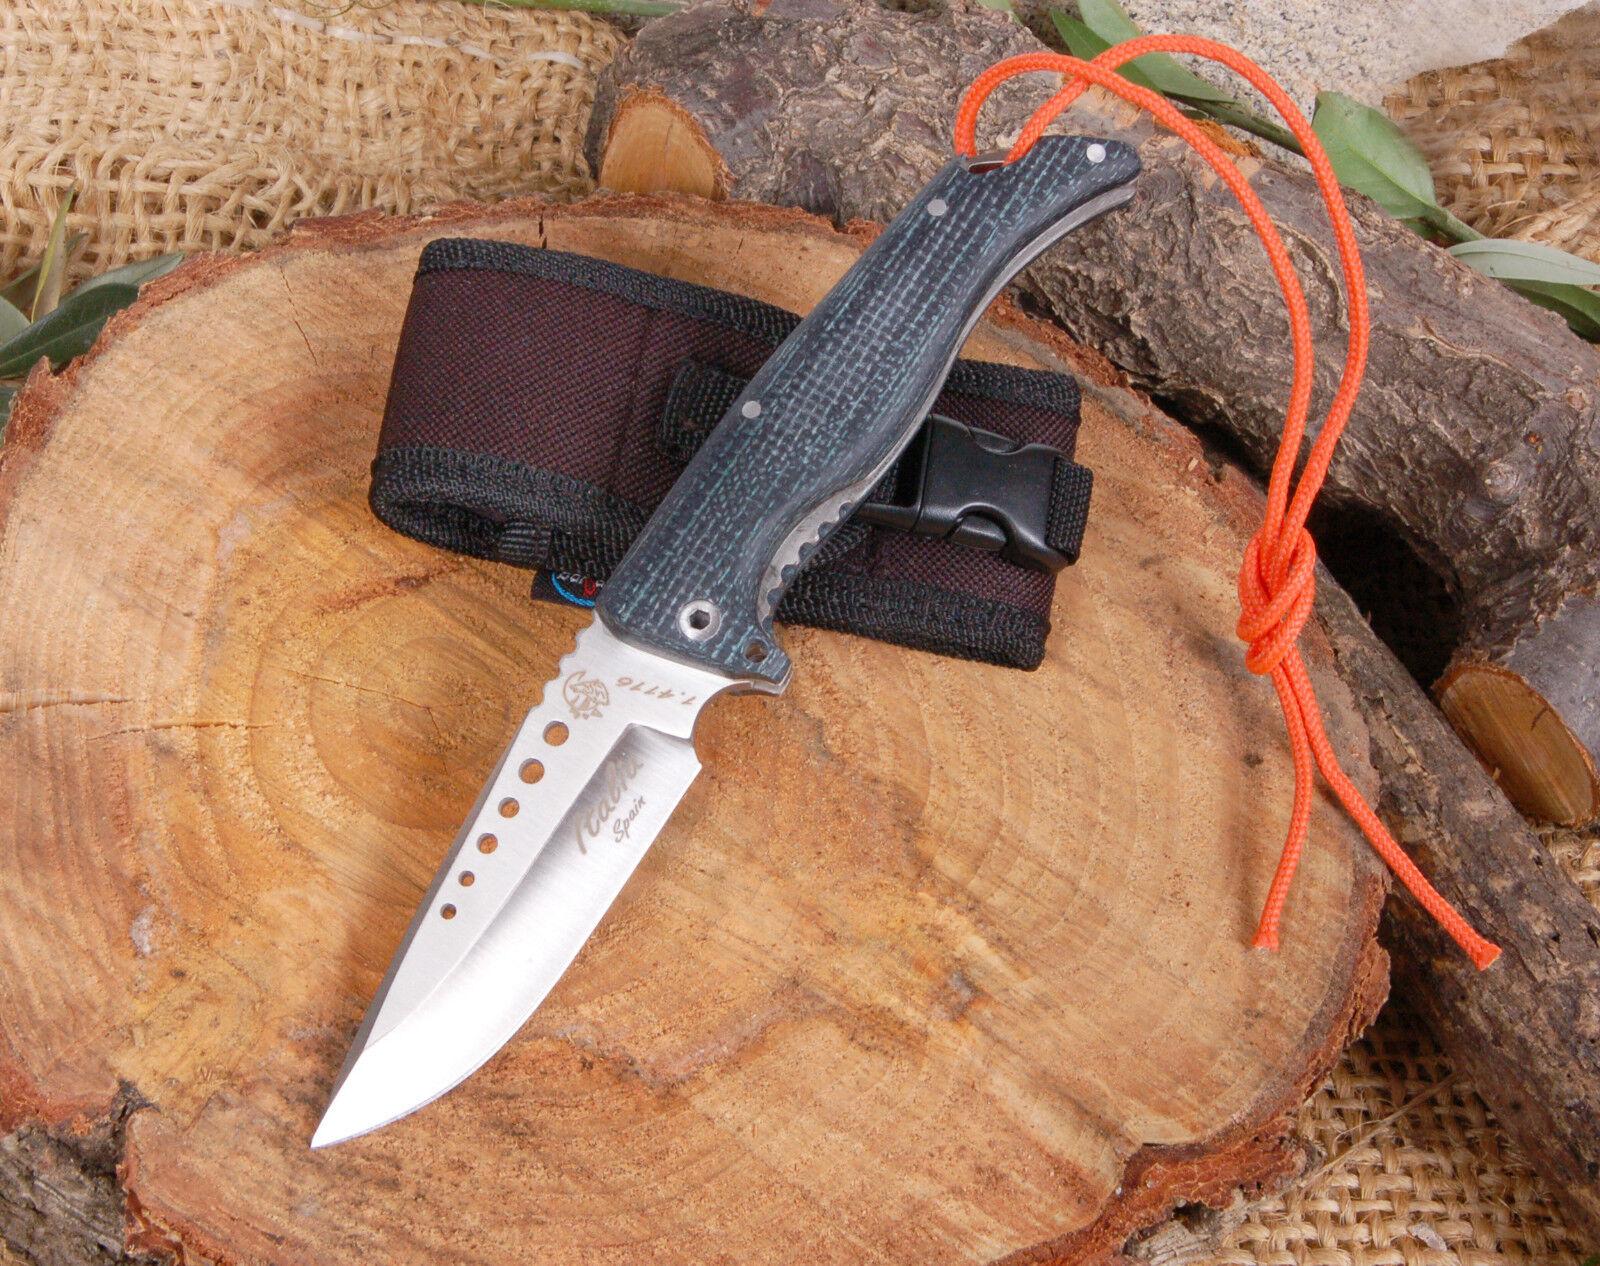 NAVAJA J&V CDA ITALIA CALADA ACERO MOVA 1.4116 MICARTA NEGRA YUTE KNIFE MESSER